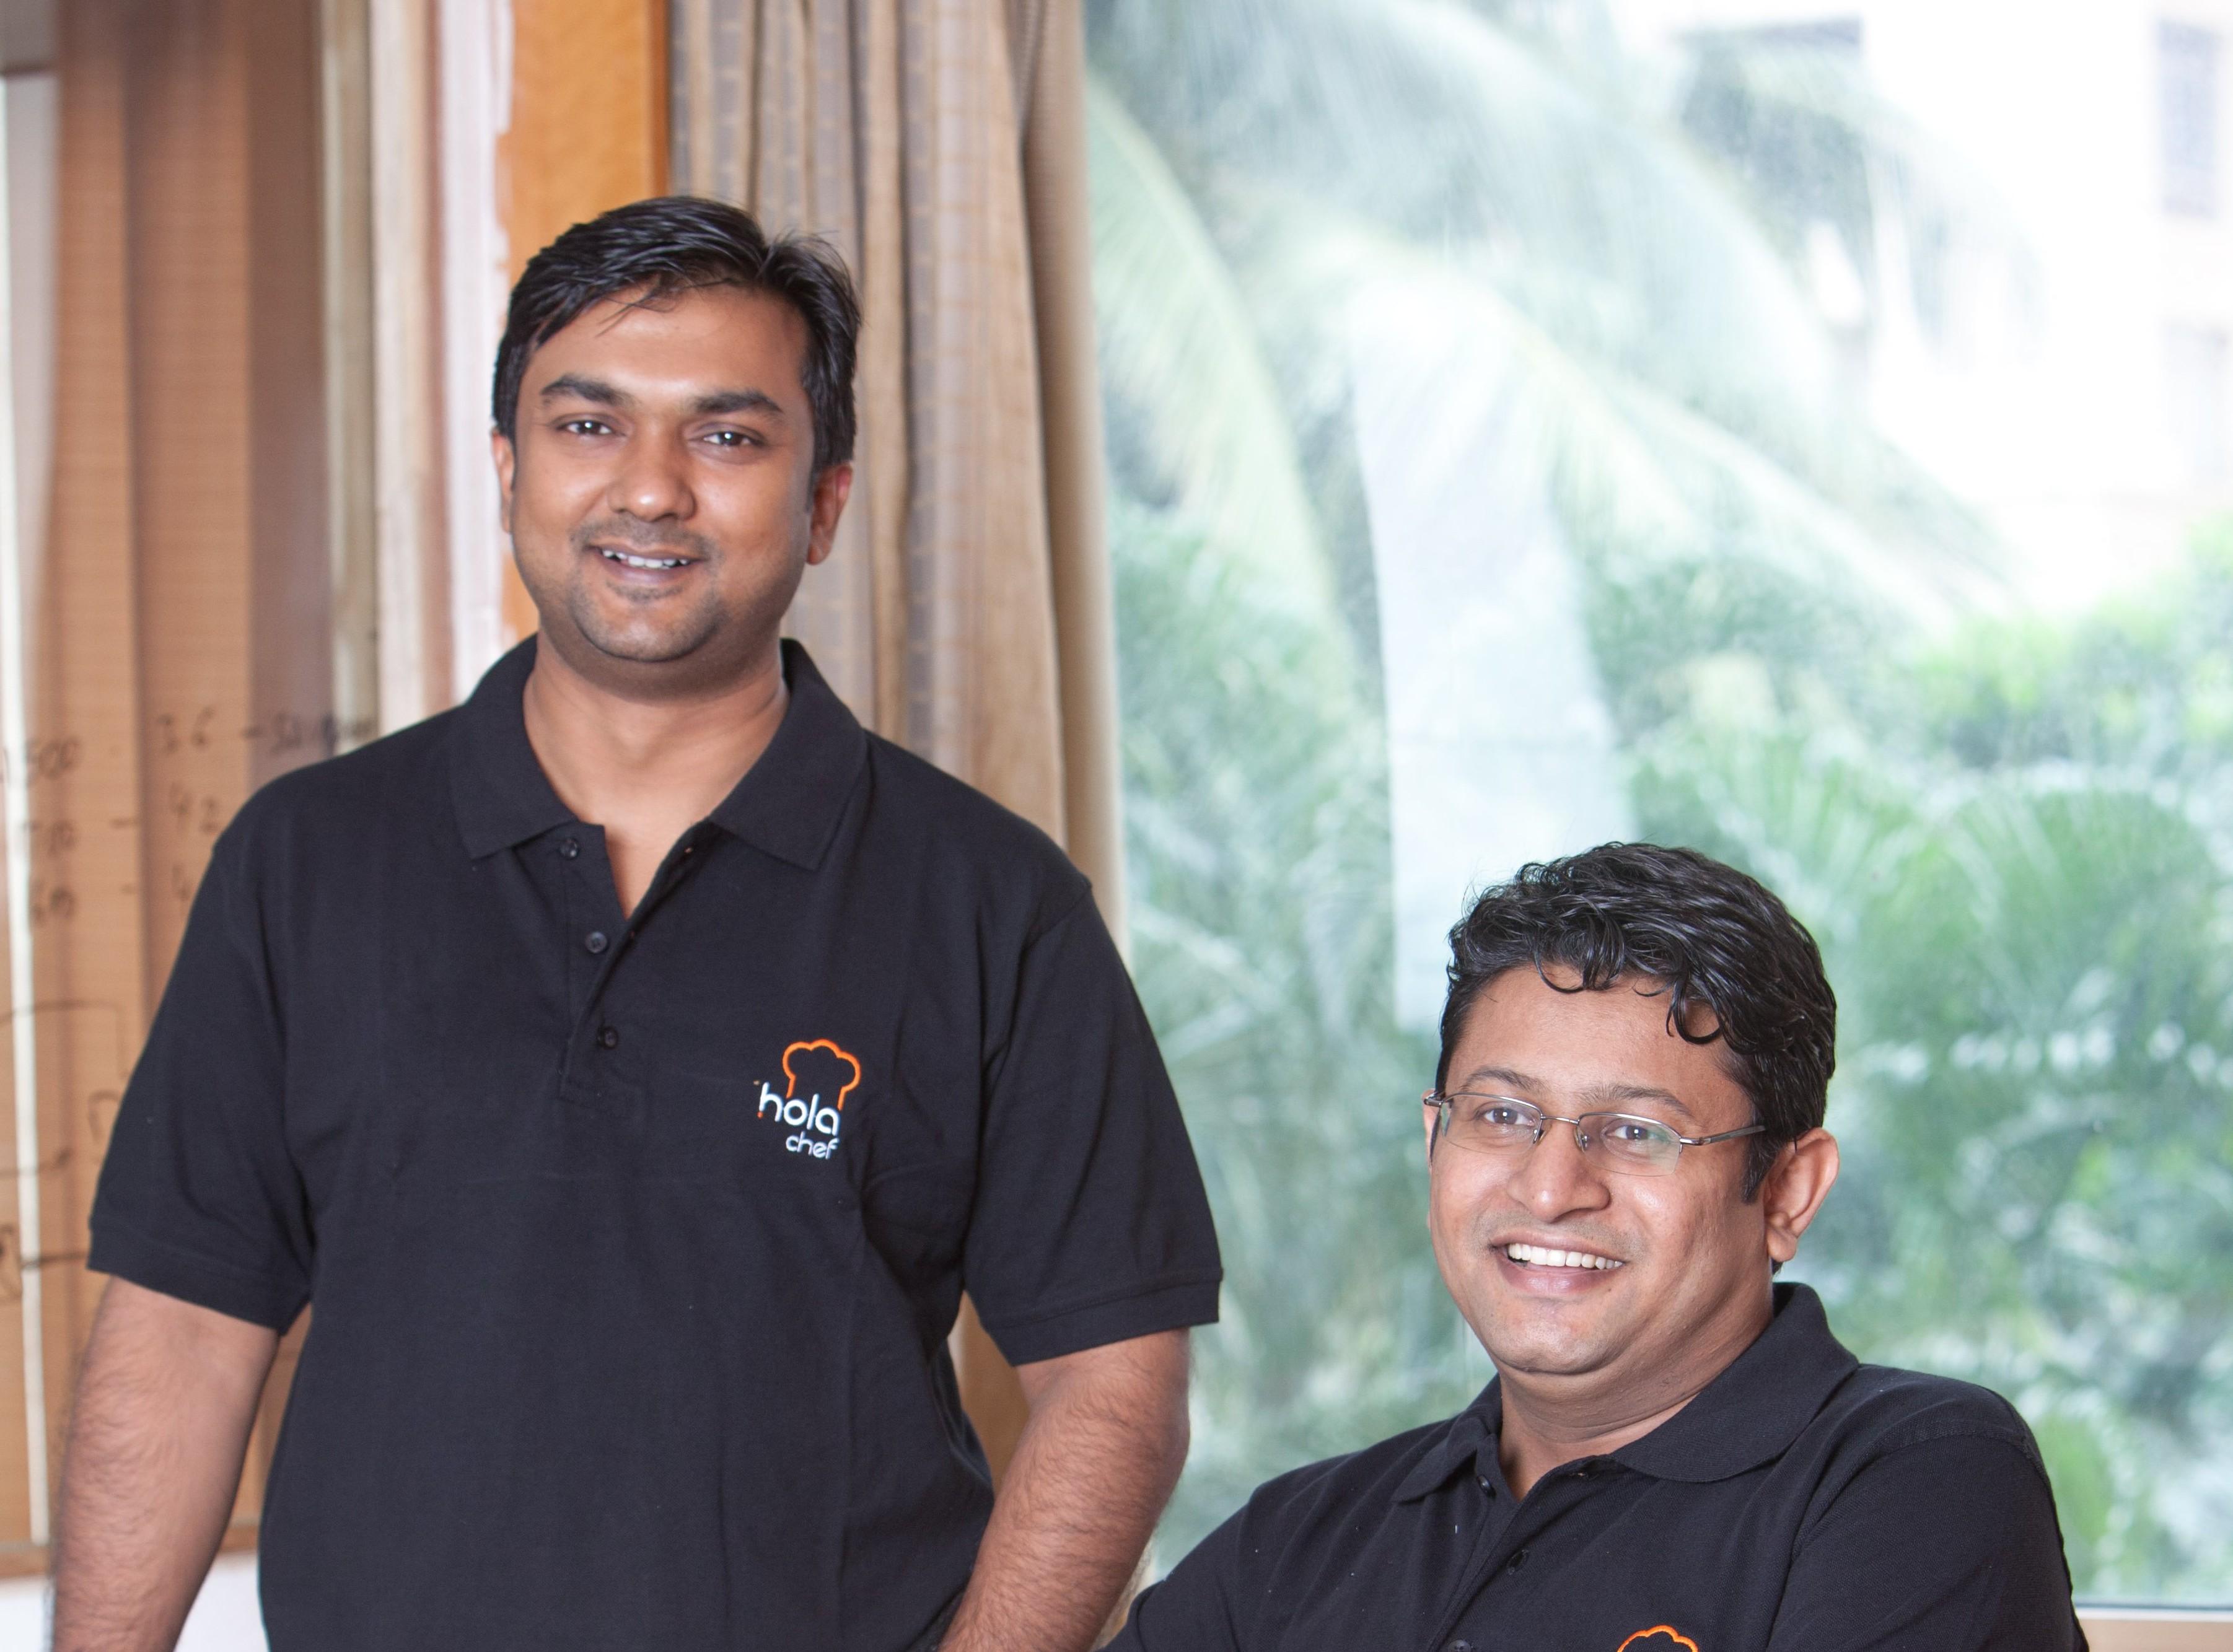 Saurabh Saxena (Left) and Anil Gelra